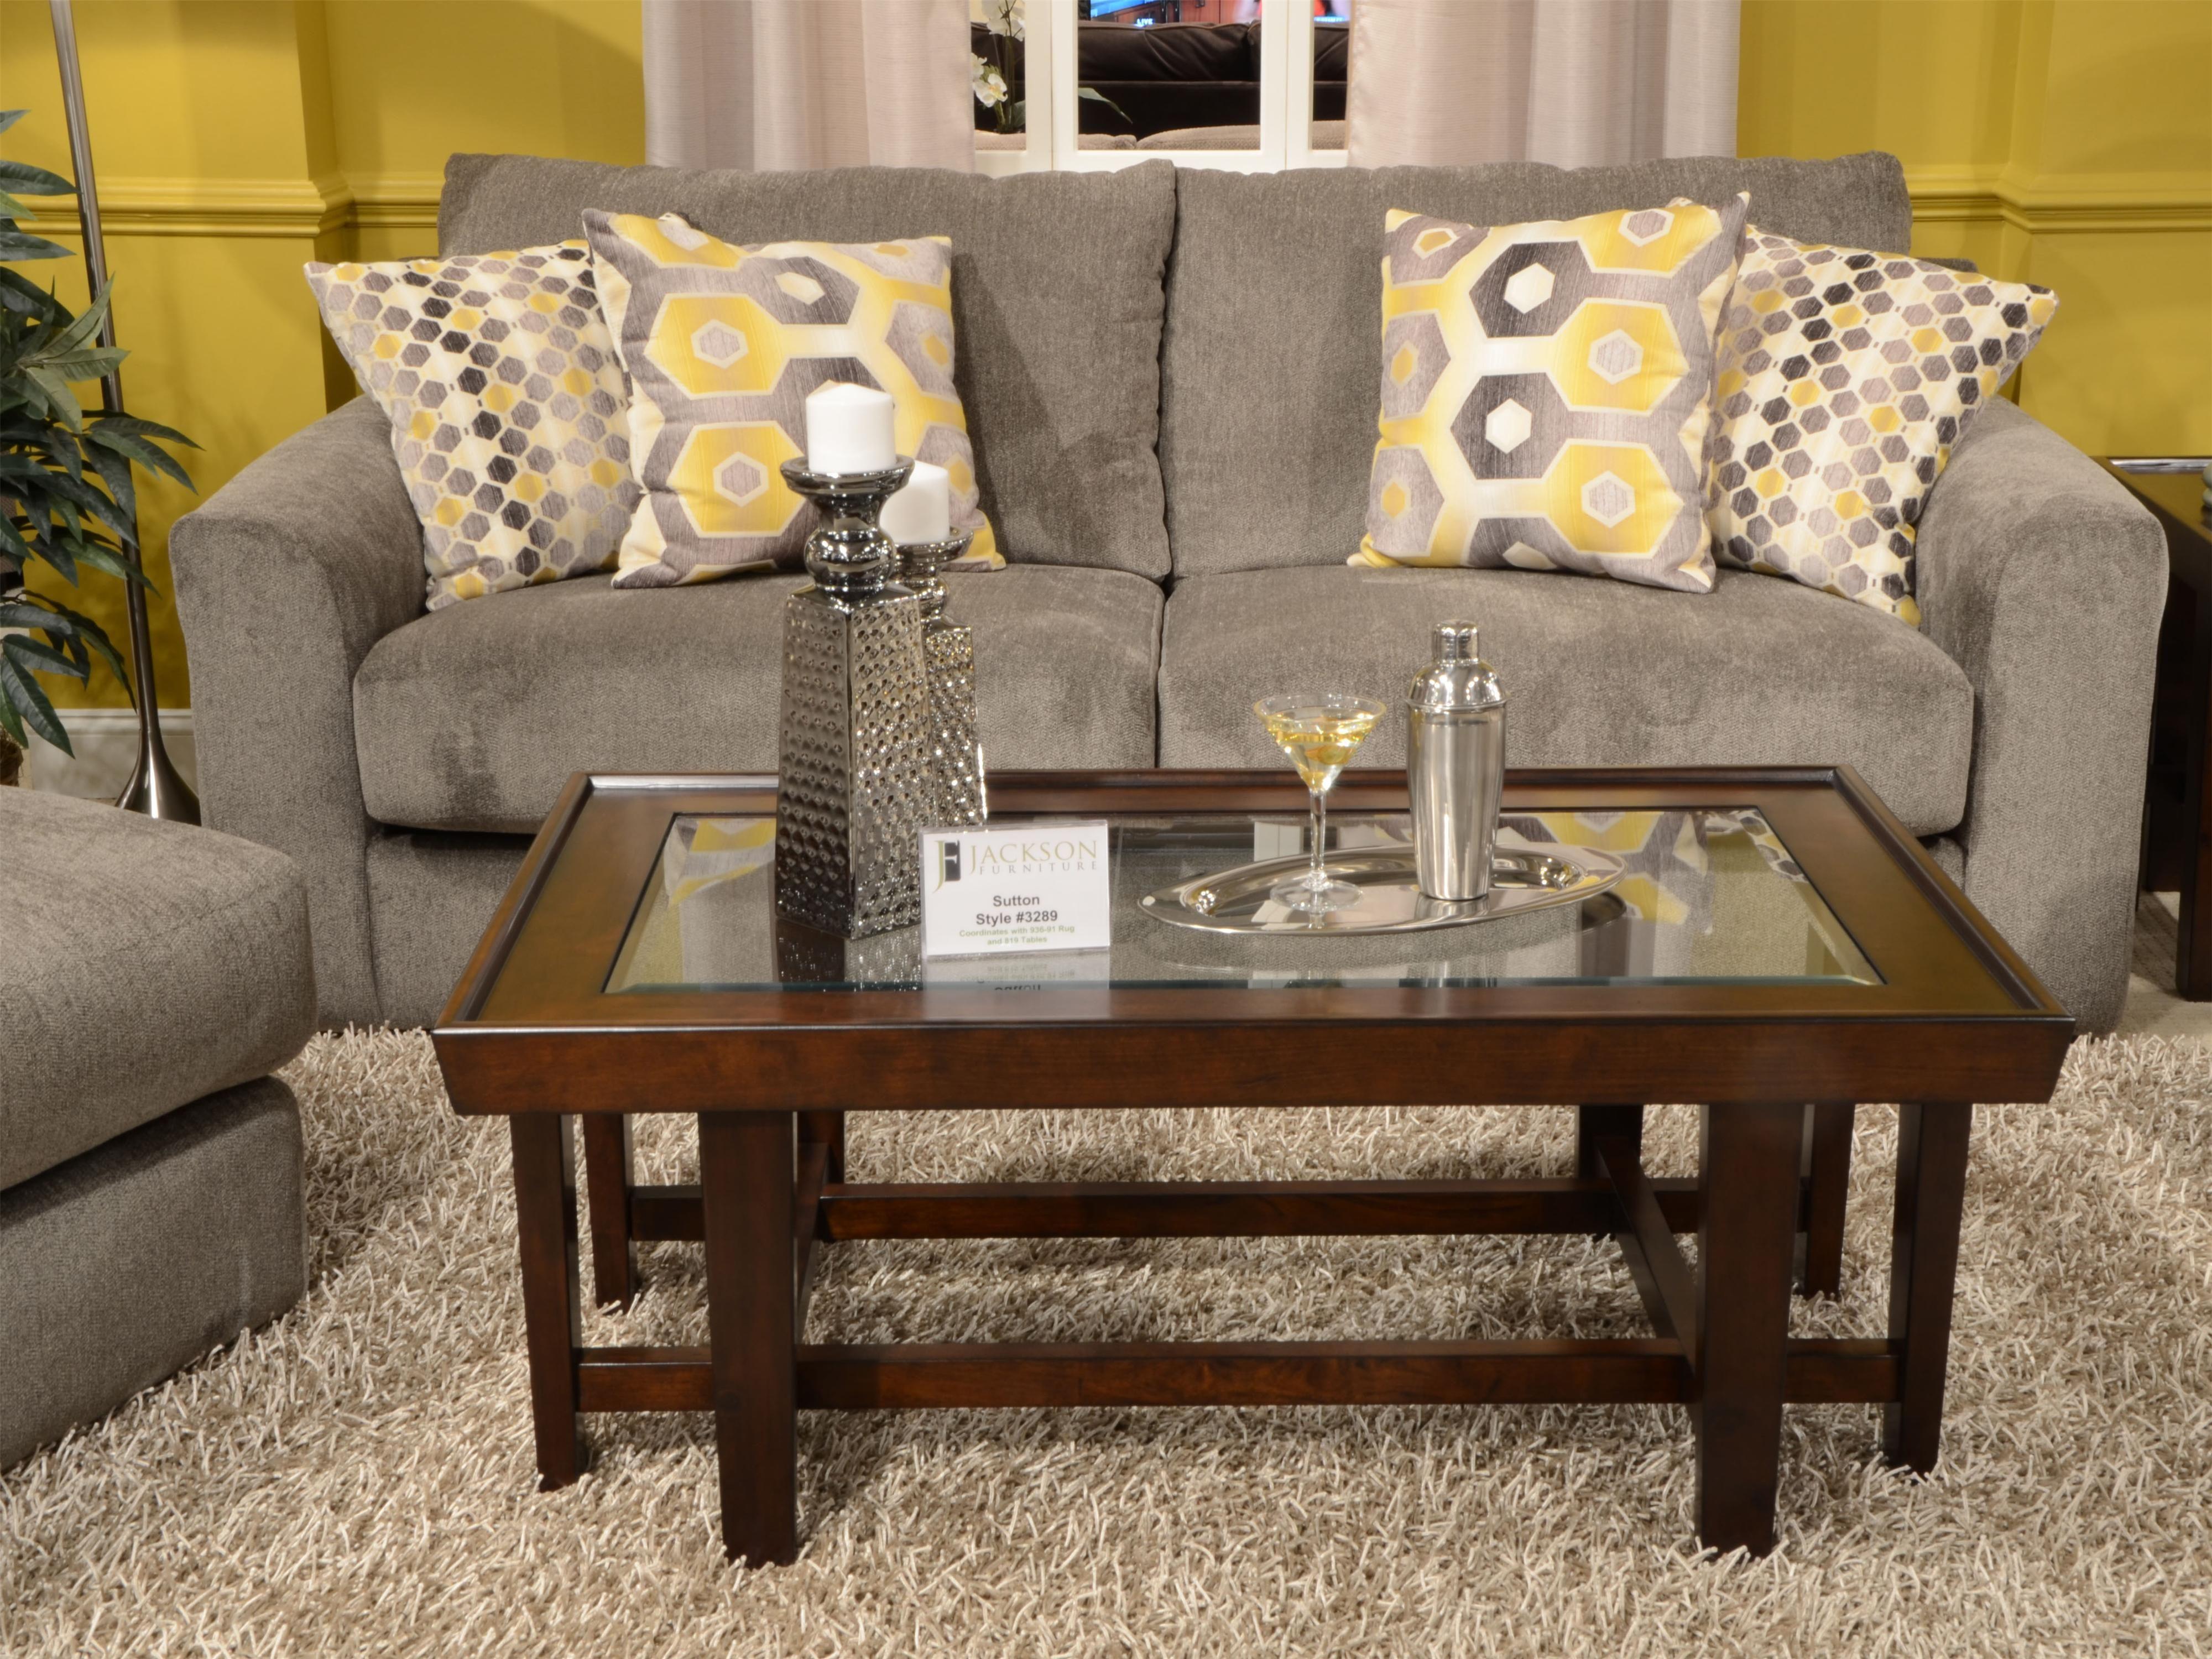 Sutton Sofa by Jackson Furniture House stuff Pinterest